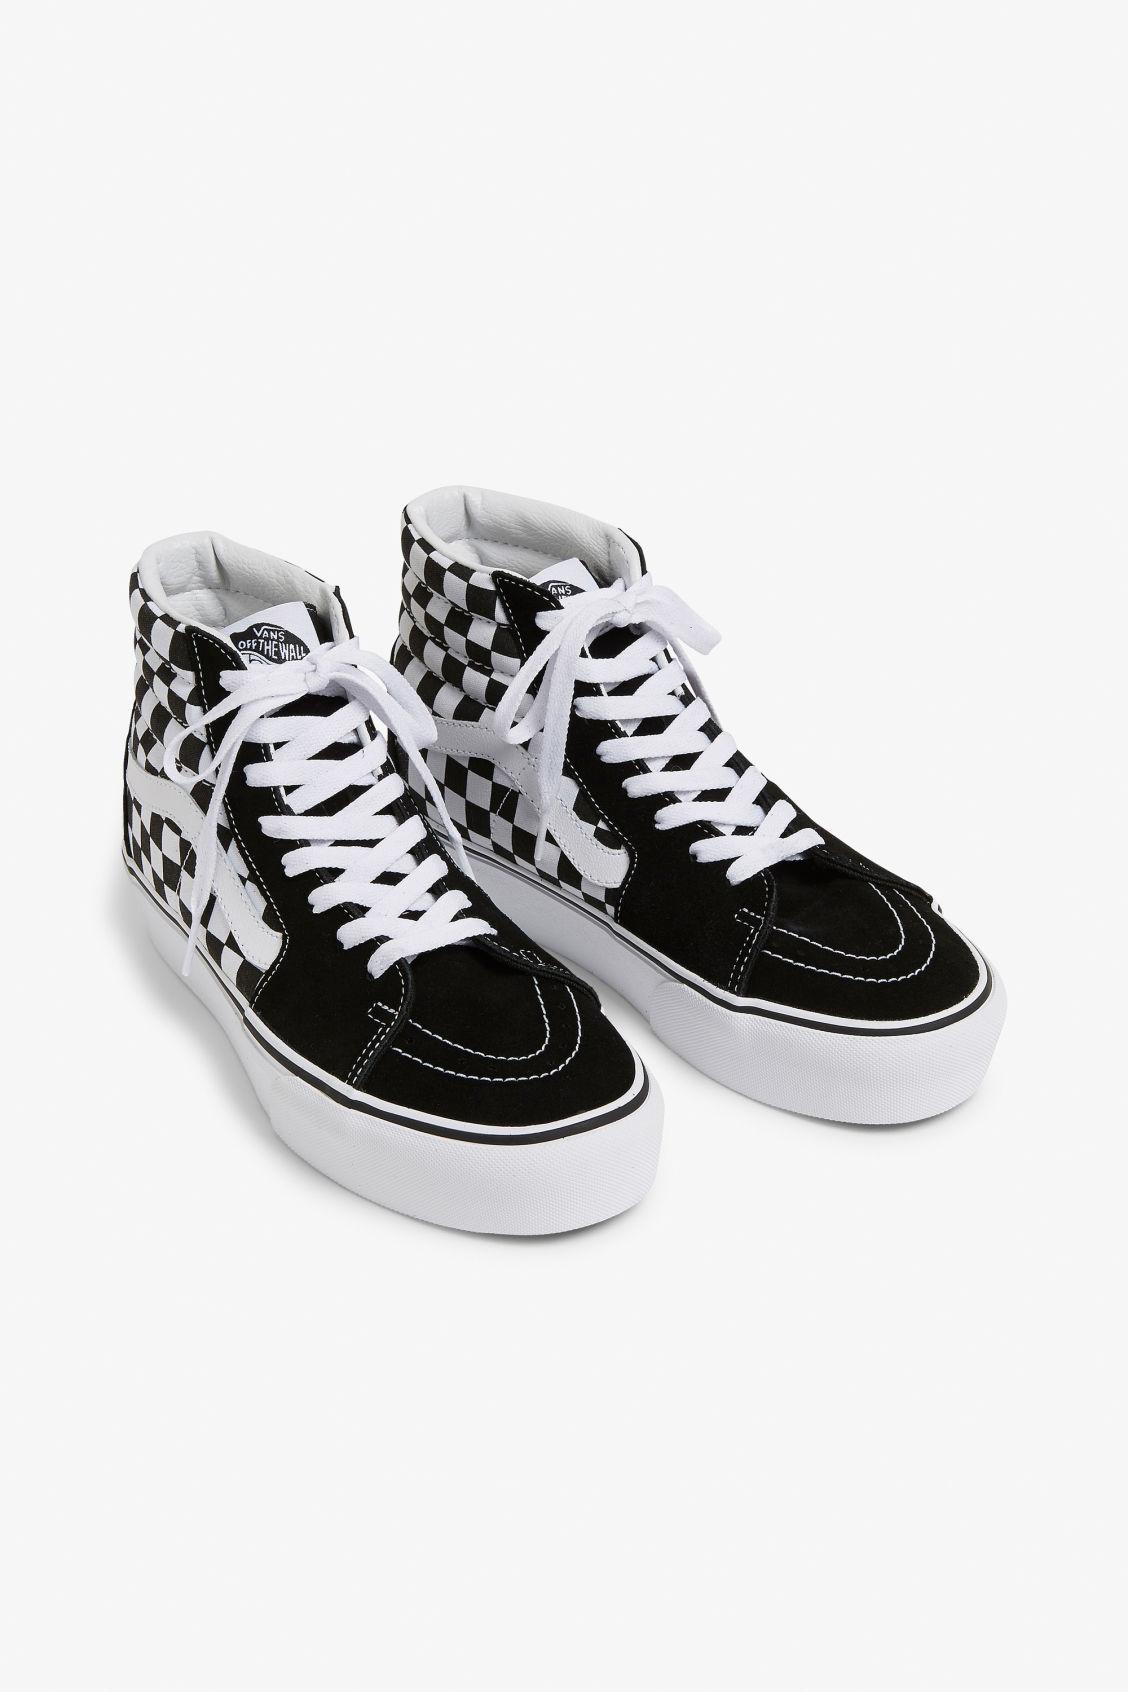 56c8996d14 Vans SK8-HI platform 2.0 - Checkered - Shoes - Monki